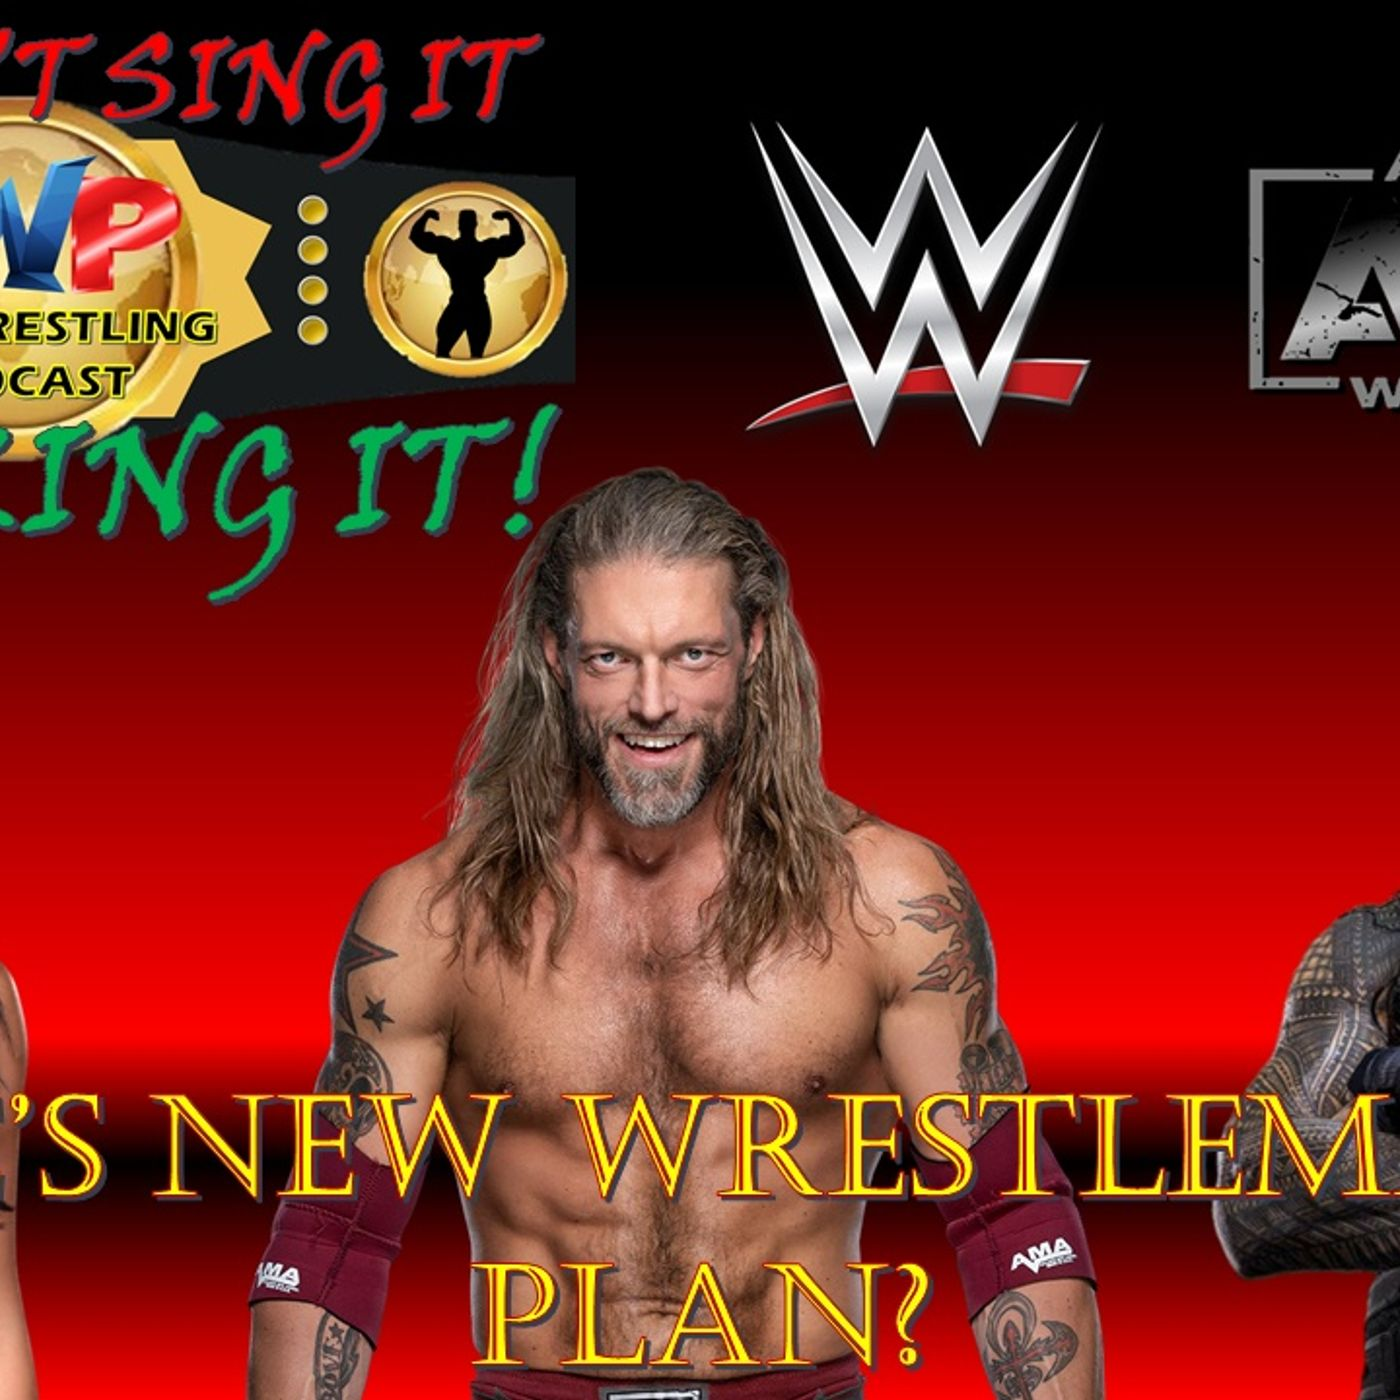 Edge's New WrestleMania Plan?